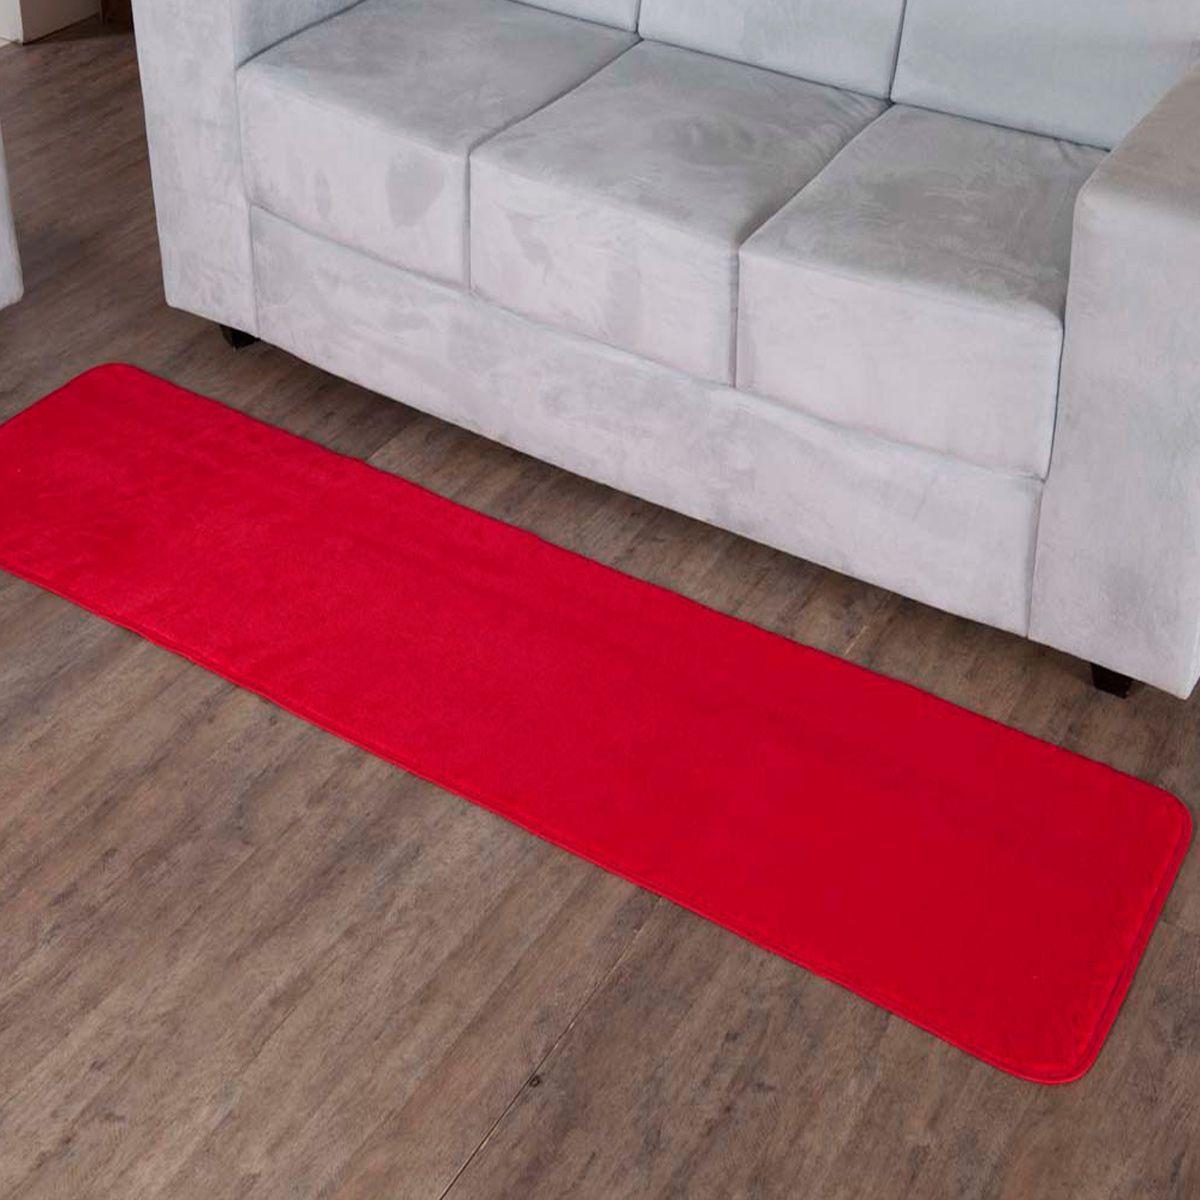 Tapete Retangular Premium p/ Sala Vermelho Liso 2,00m x 0,52m